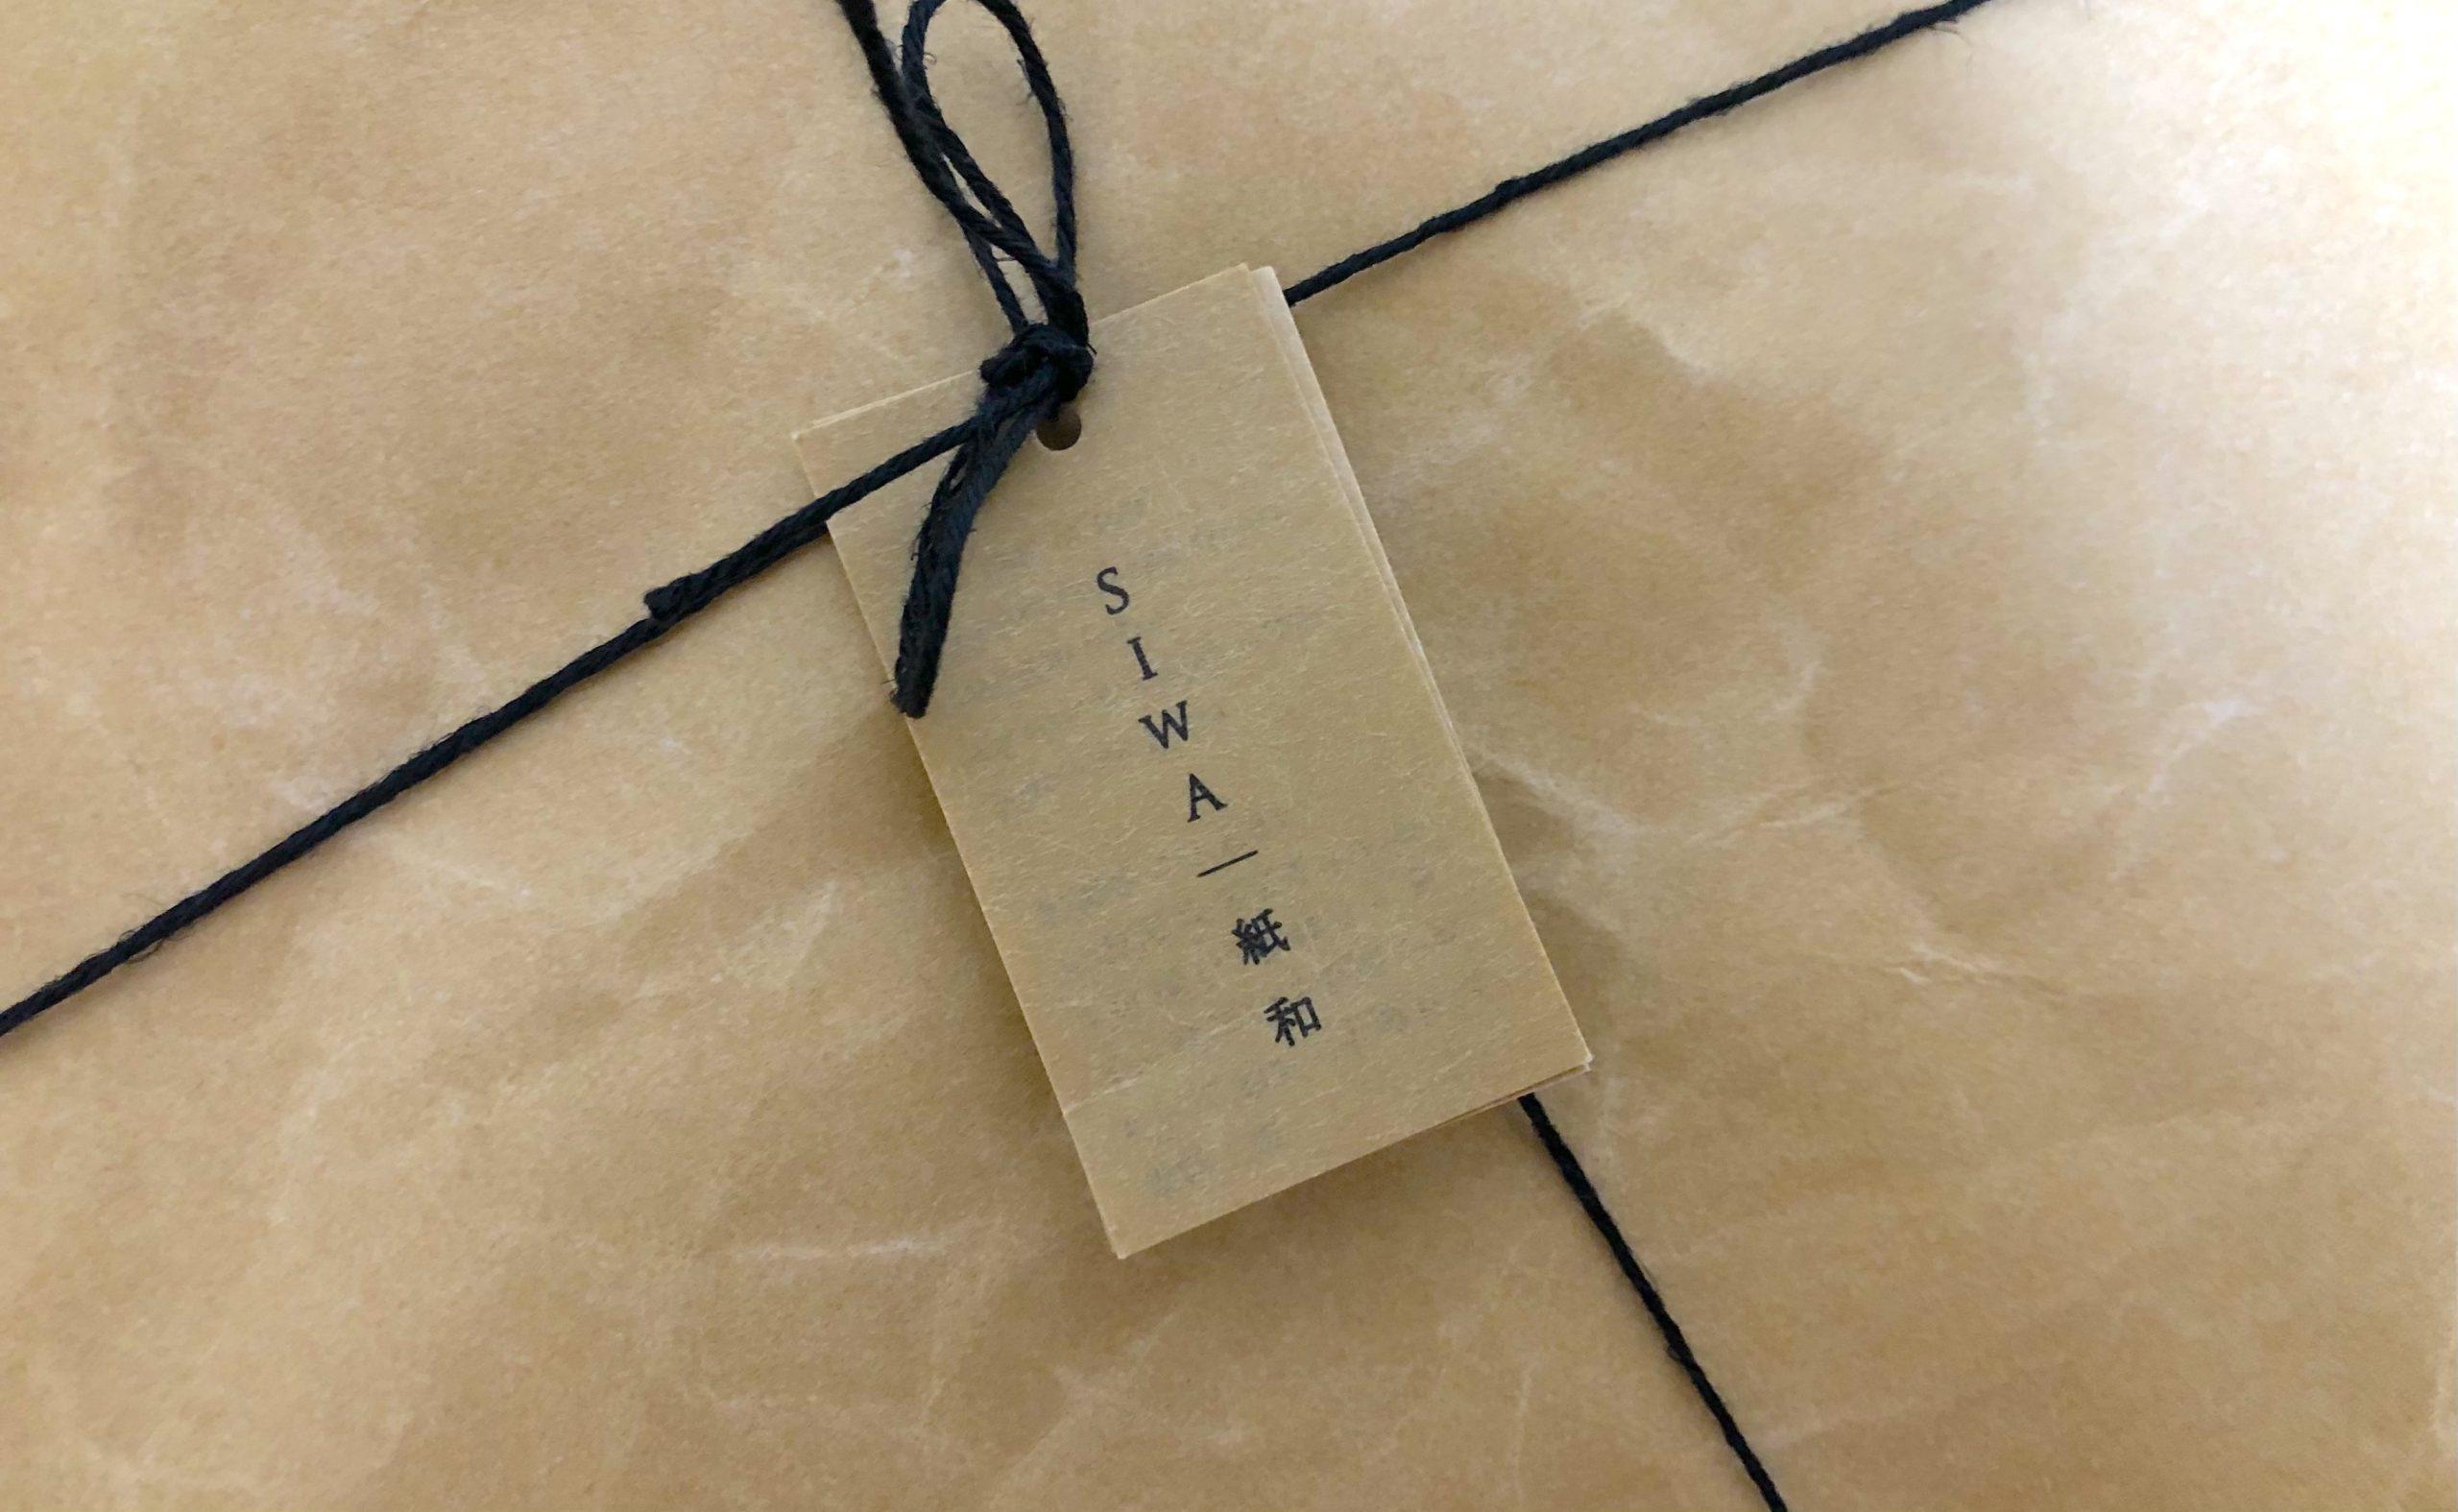 SIWA(紙和)について【和紙を使った粋なプロダクト】